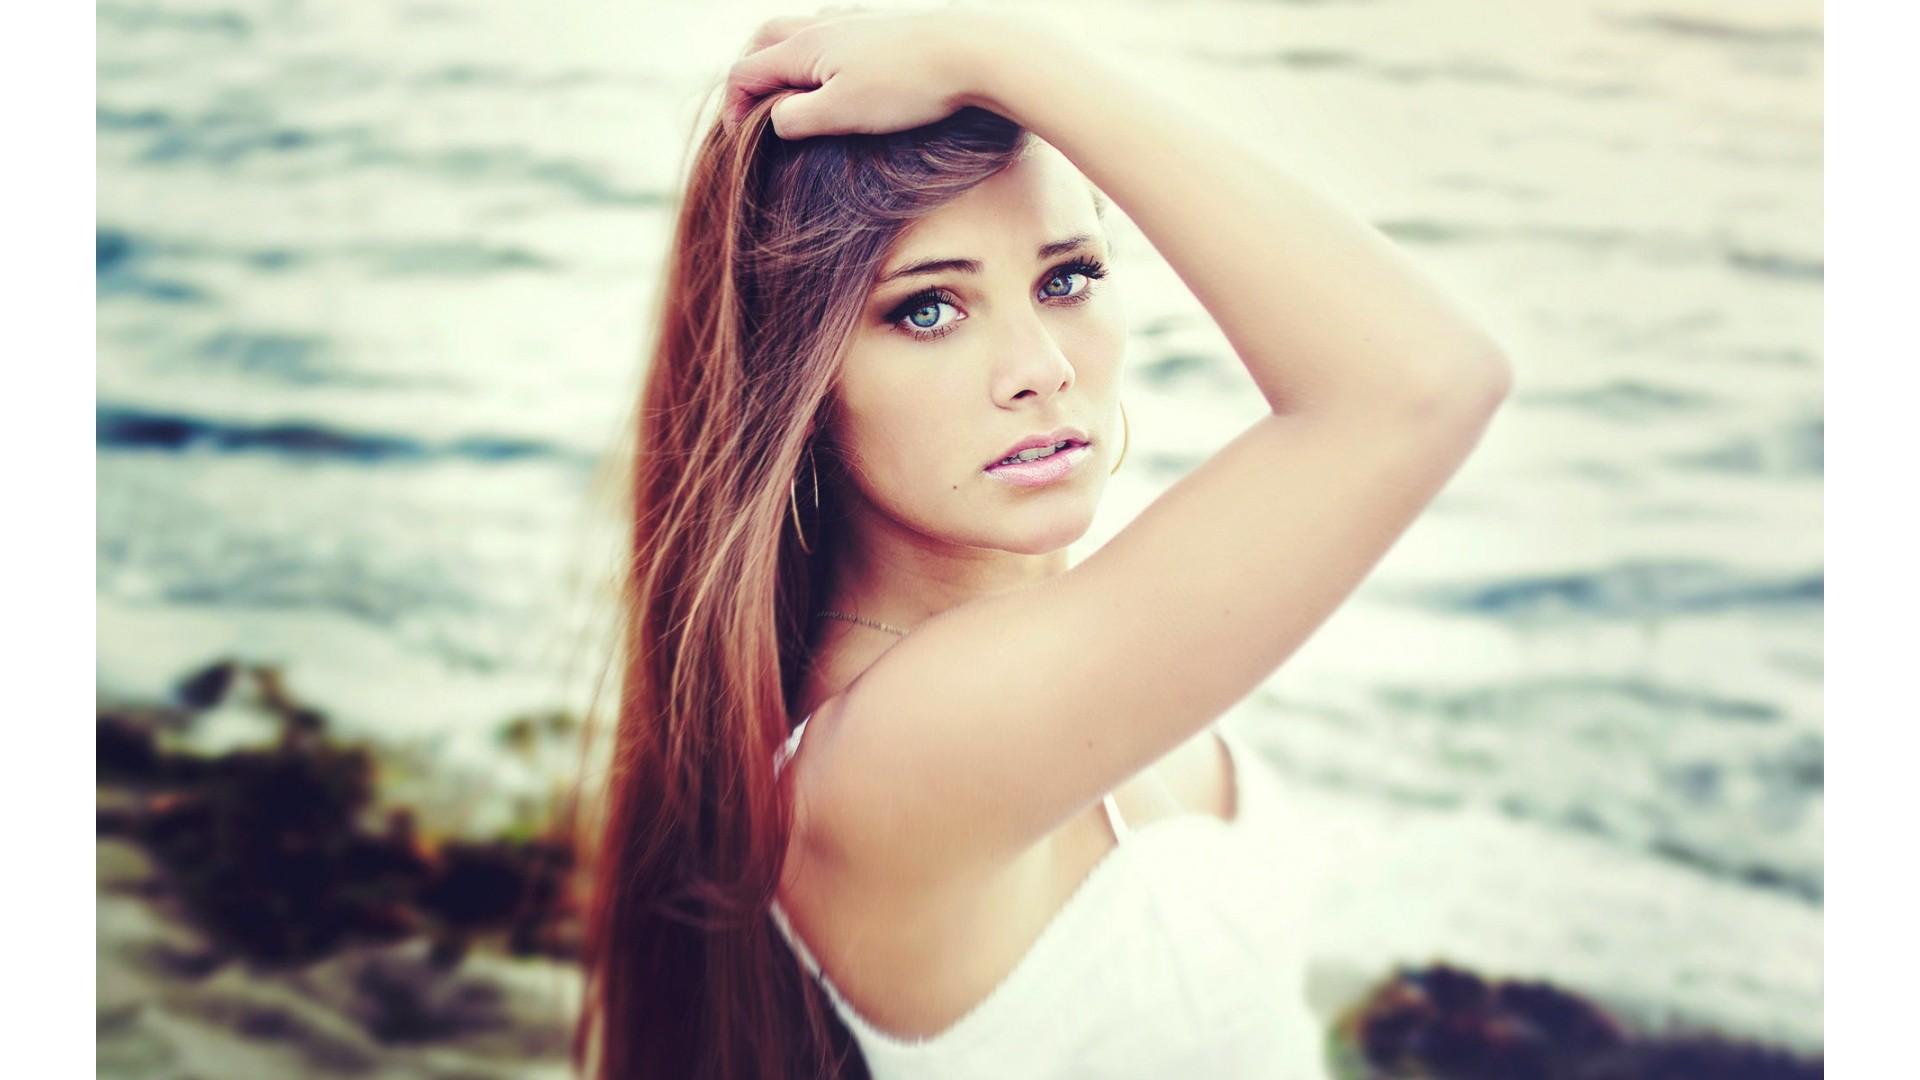 beautiful girls wallpapers tags beautiful woman pretty girl face close